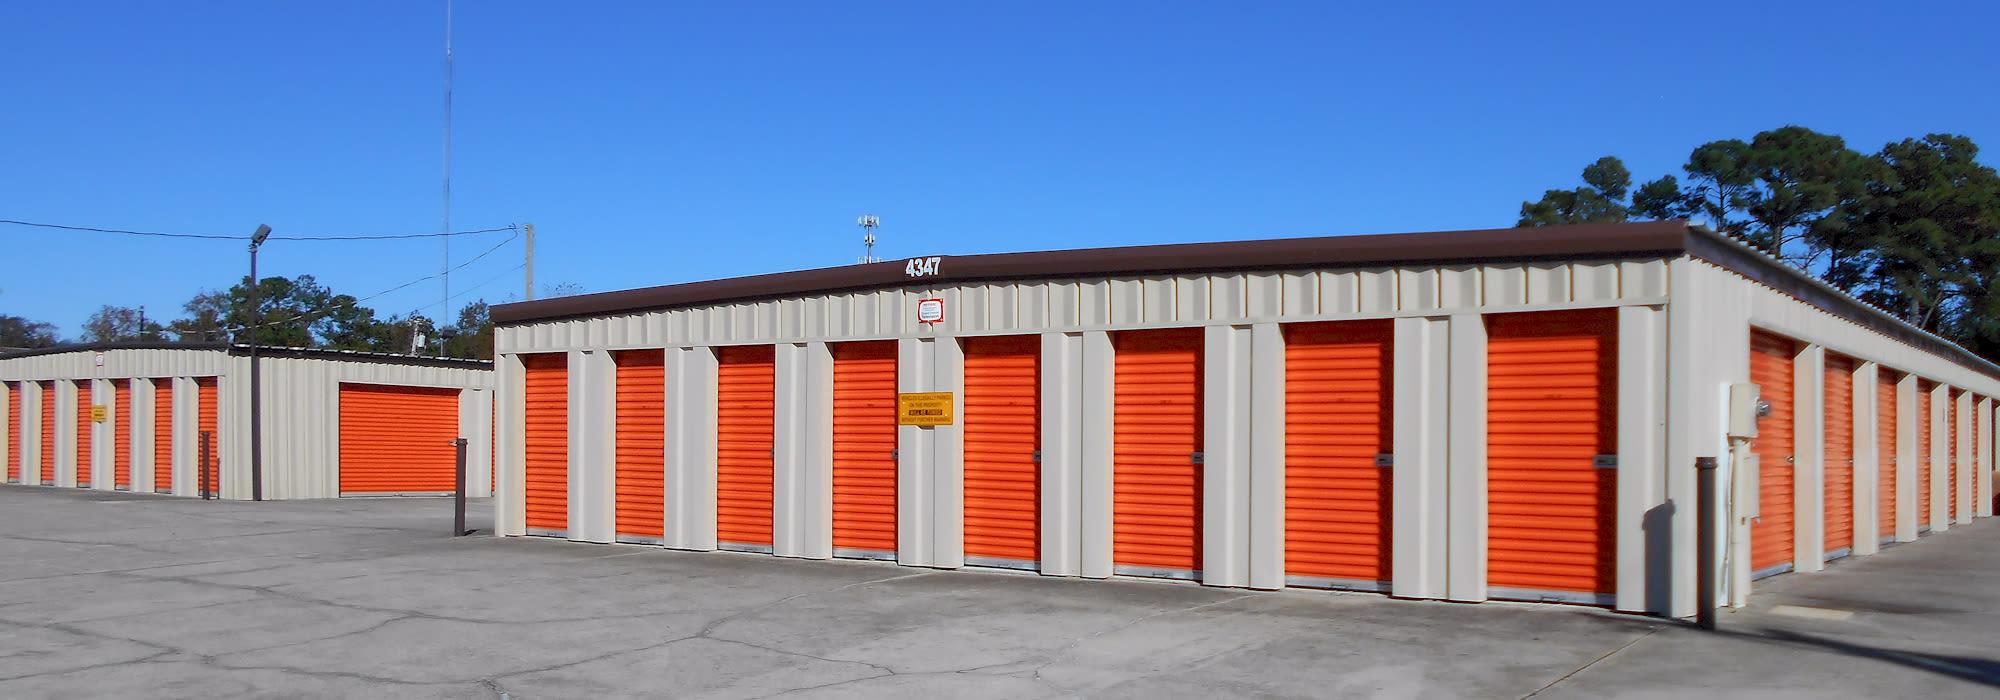 Prime Storage in Little River, SC